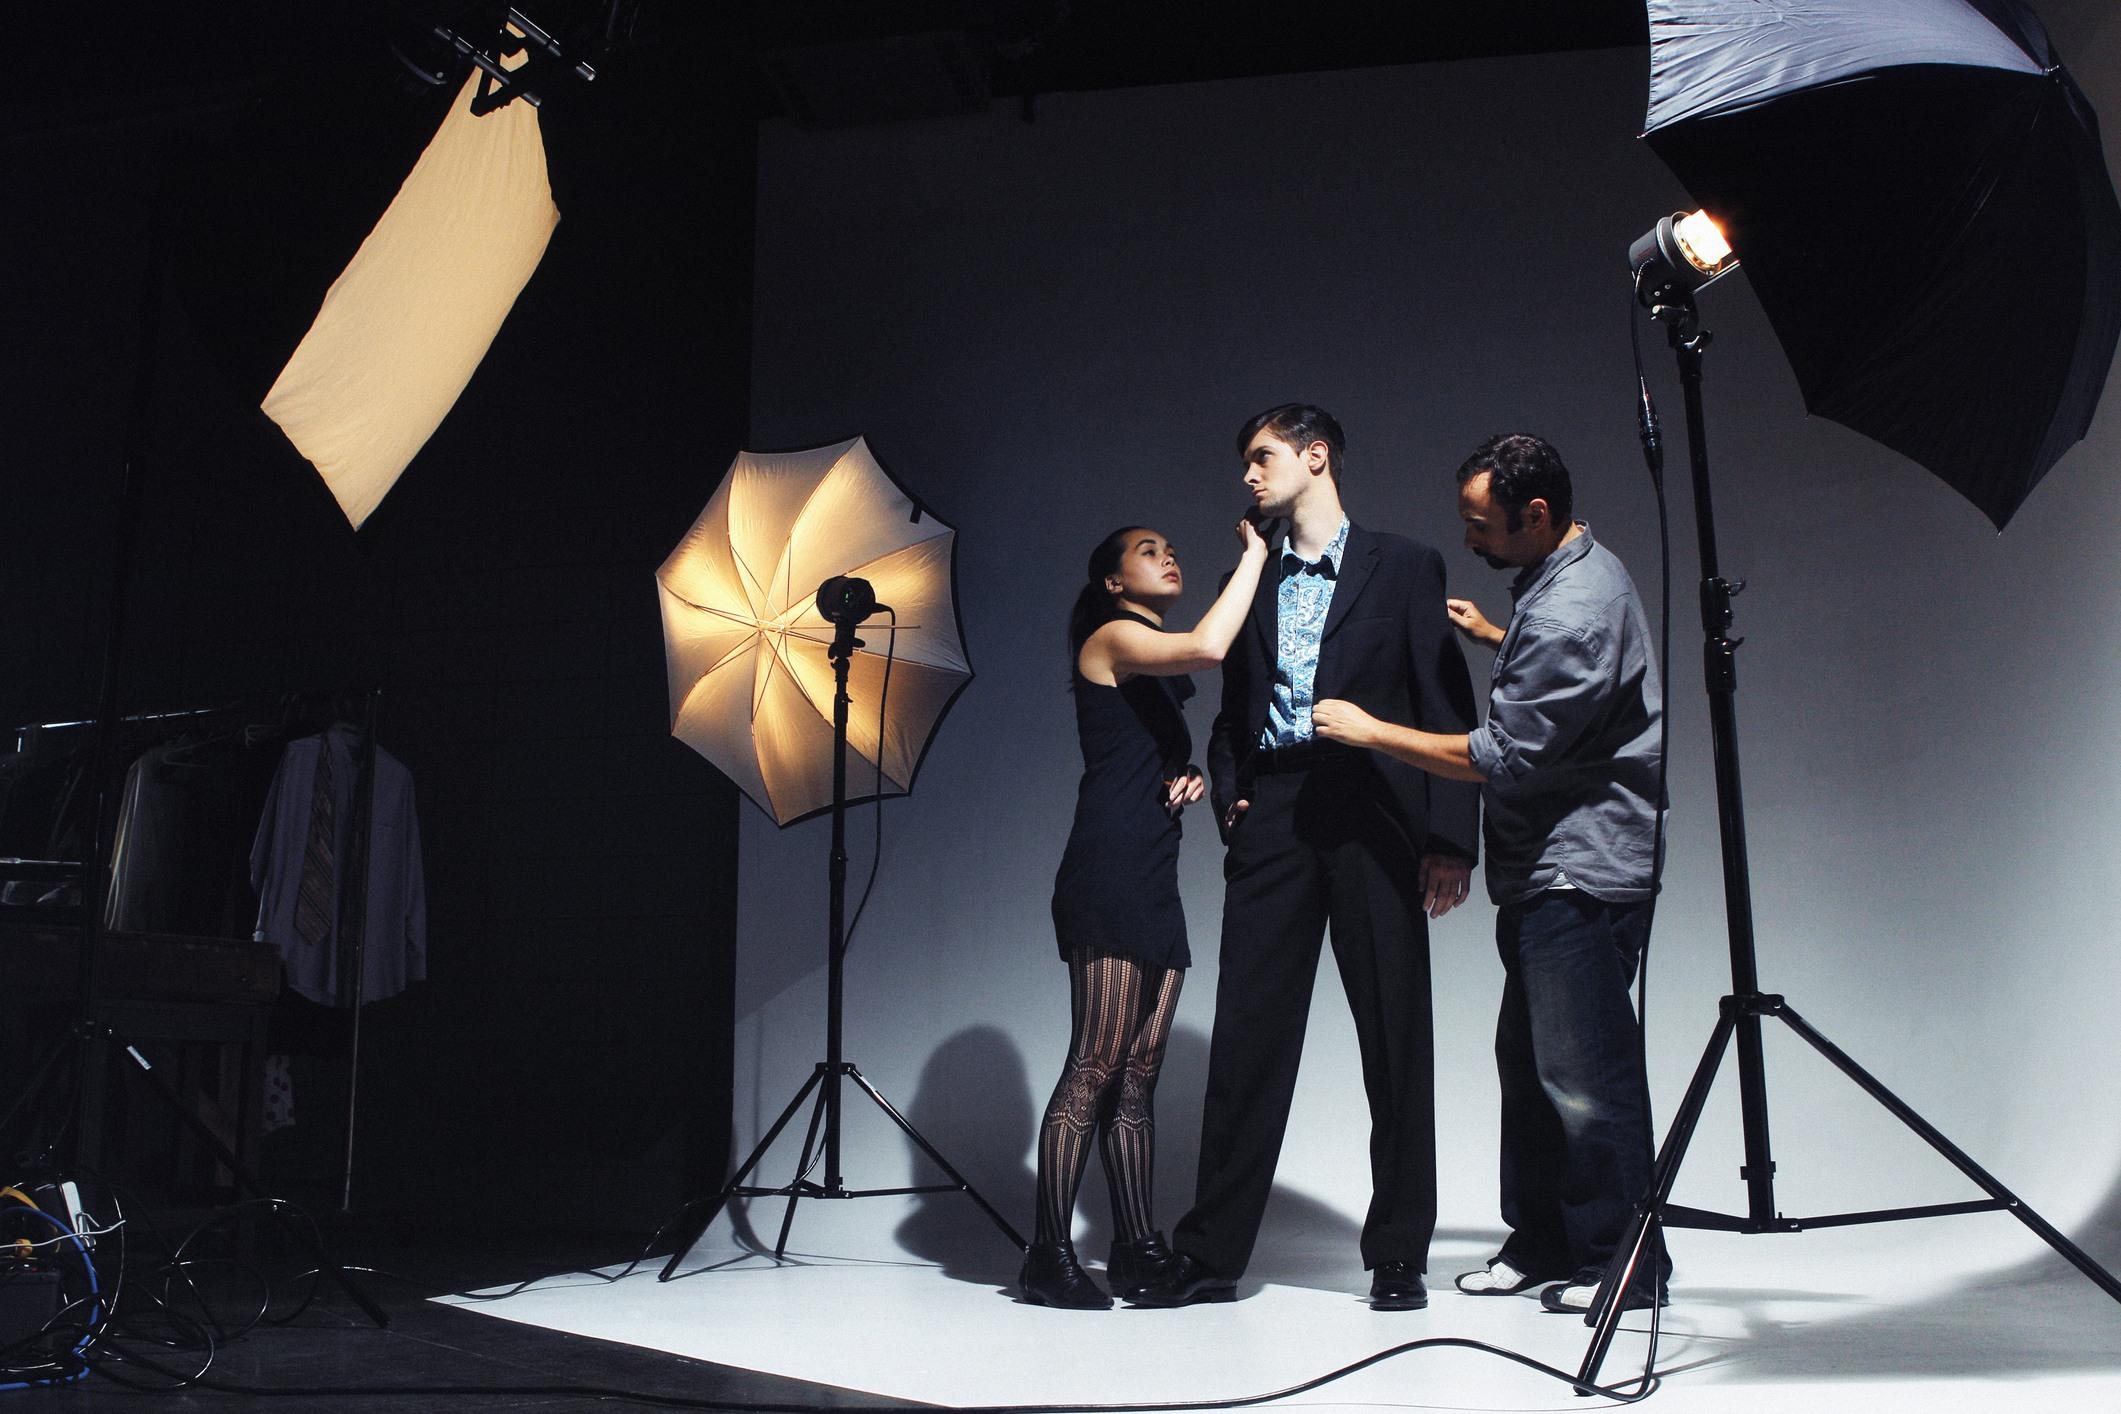 photo shoot vs. photoshoot image